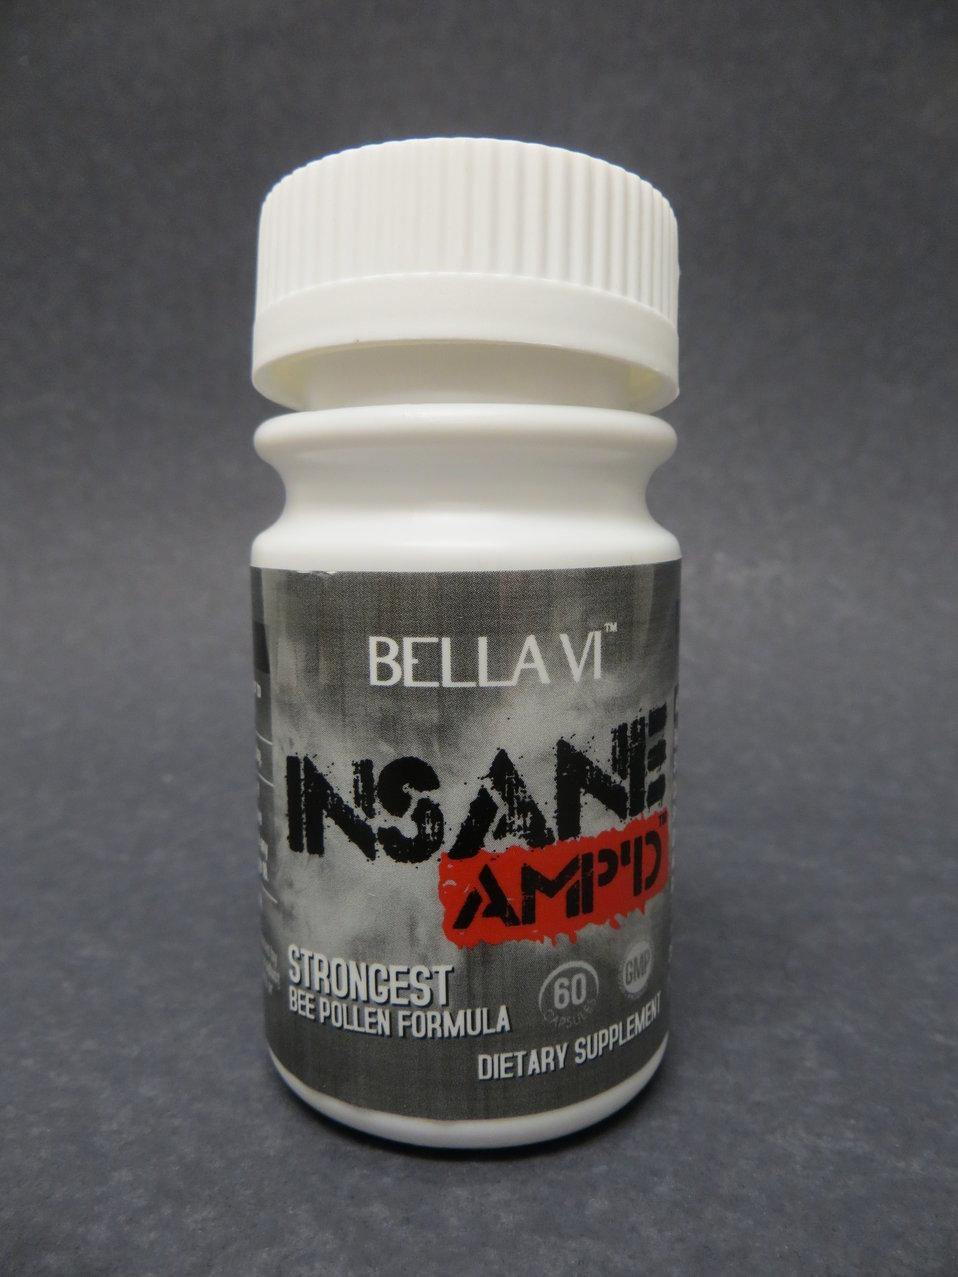 Insane Amp'd